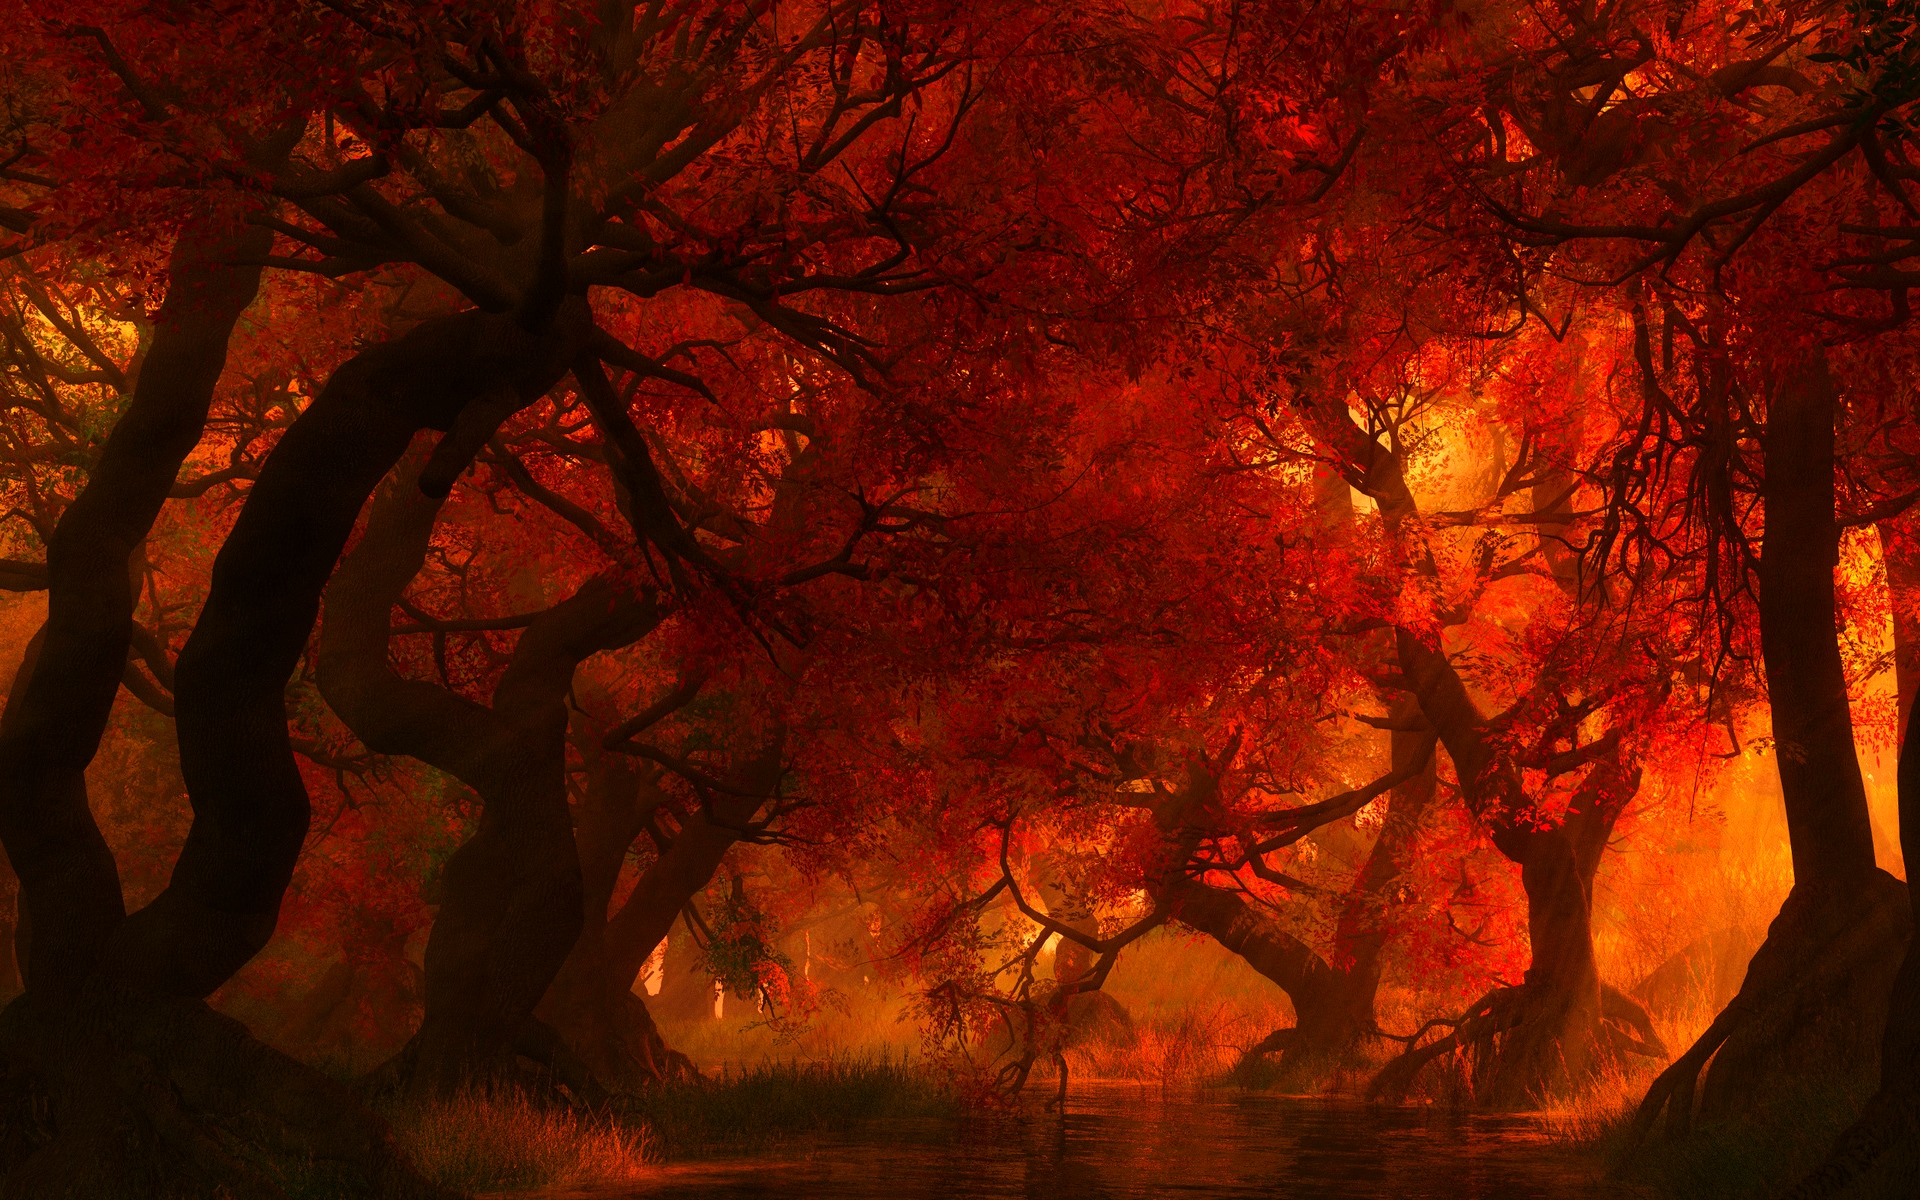 Компьютерная Графика - Природа  Лес солнце Mystic река Привидение Woman Behind Дерево Обои